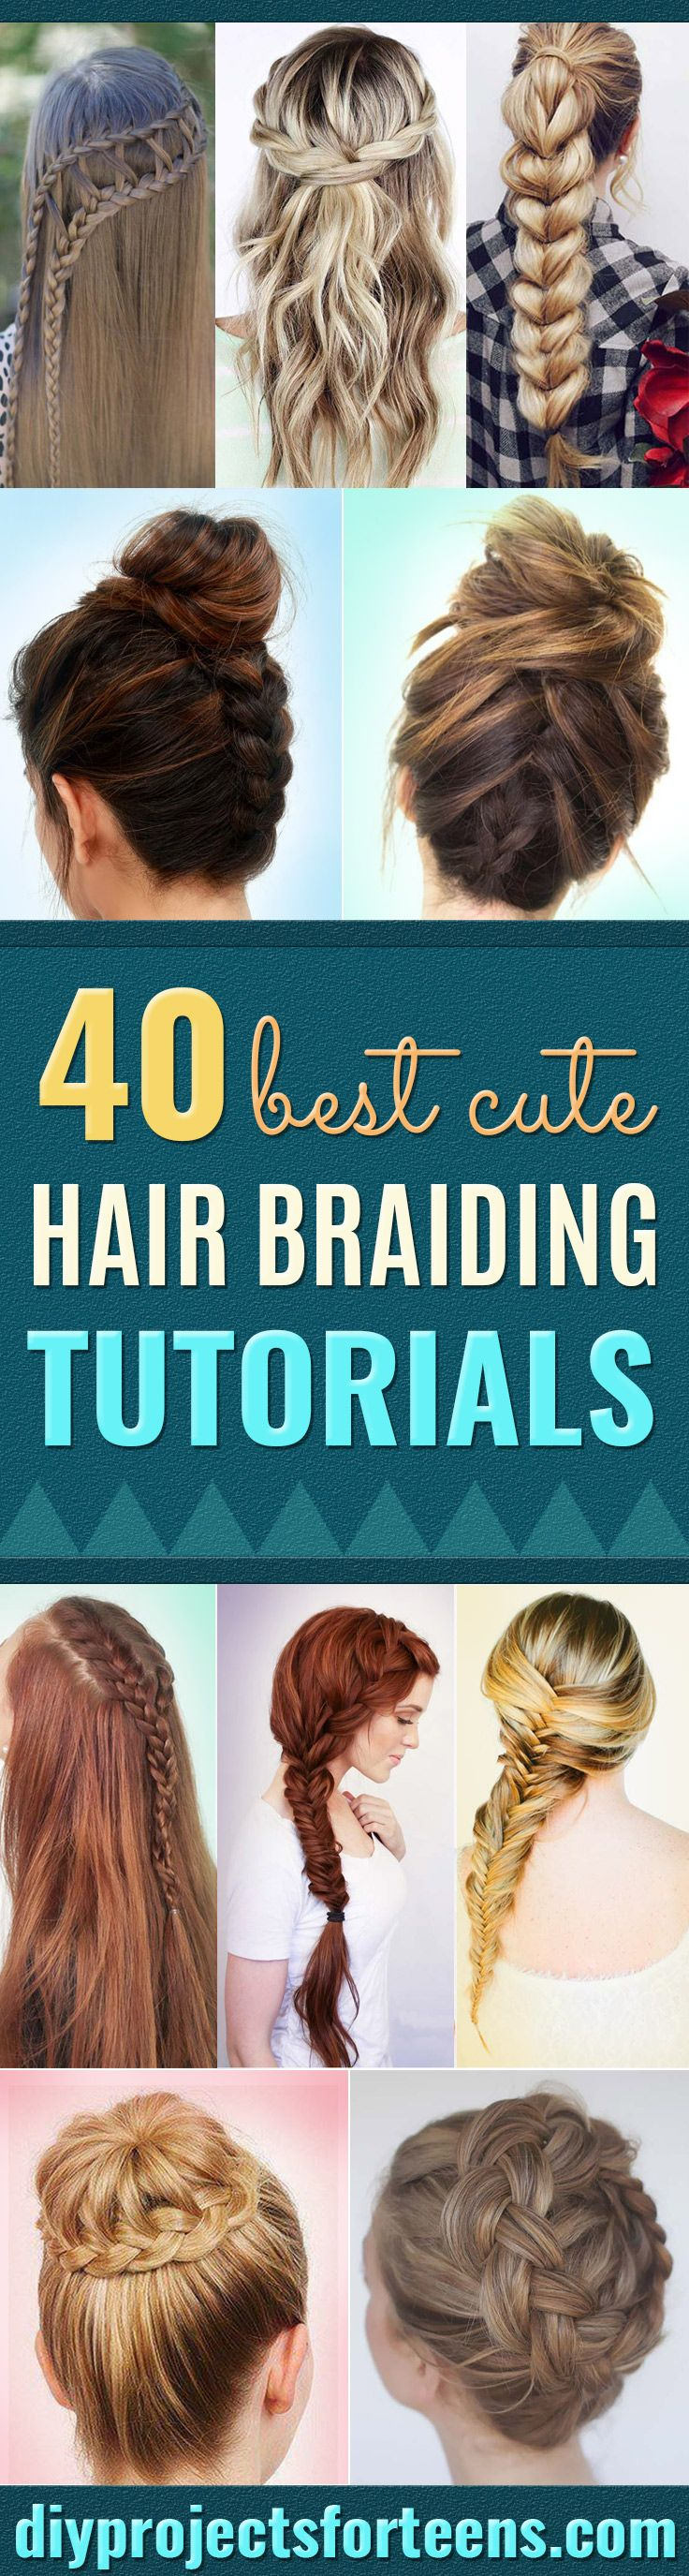 Best 53 Hairstyles ideas on Pinterest